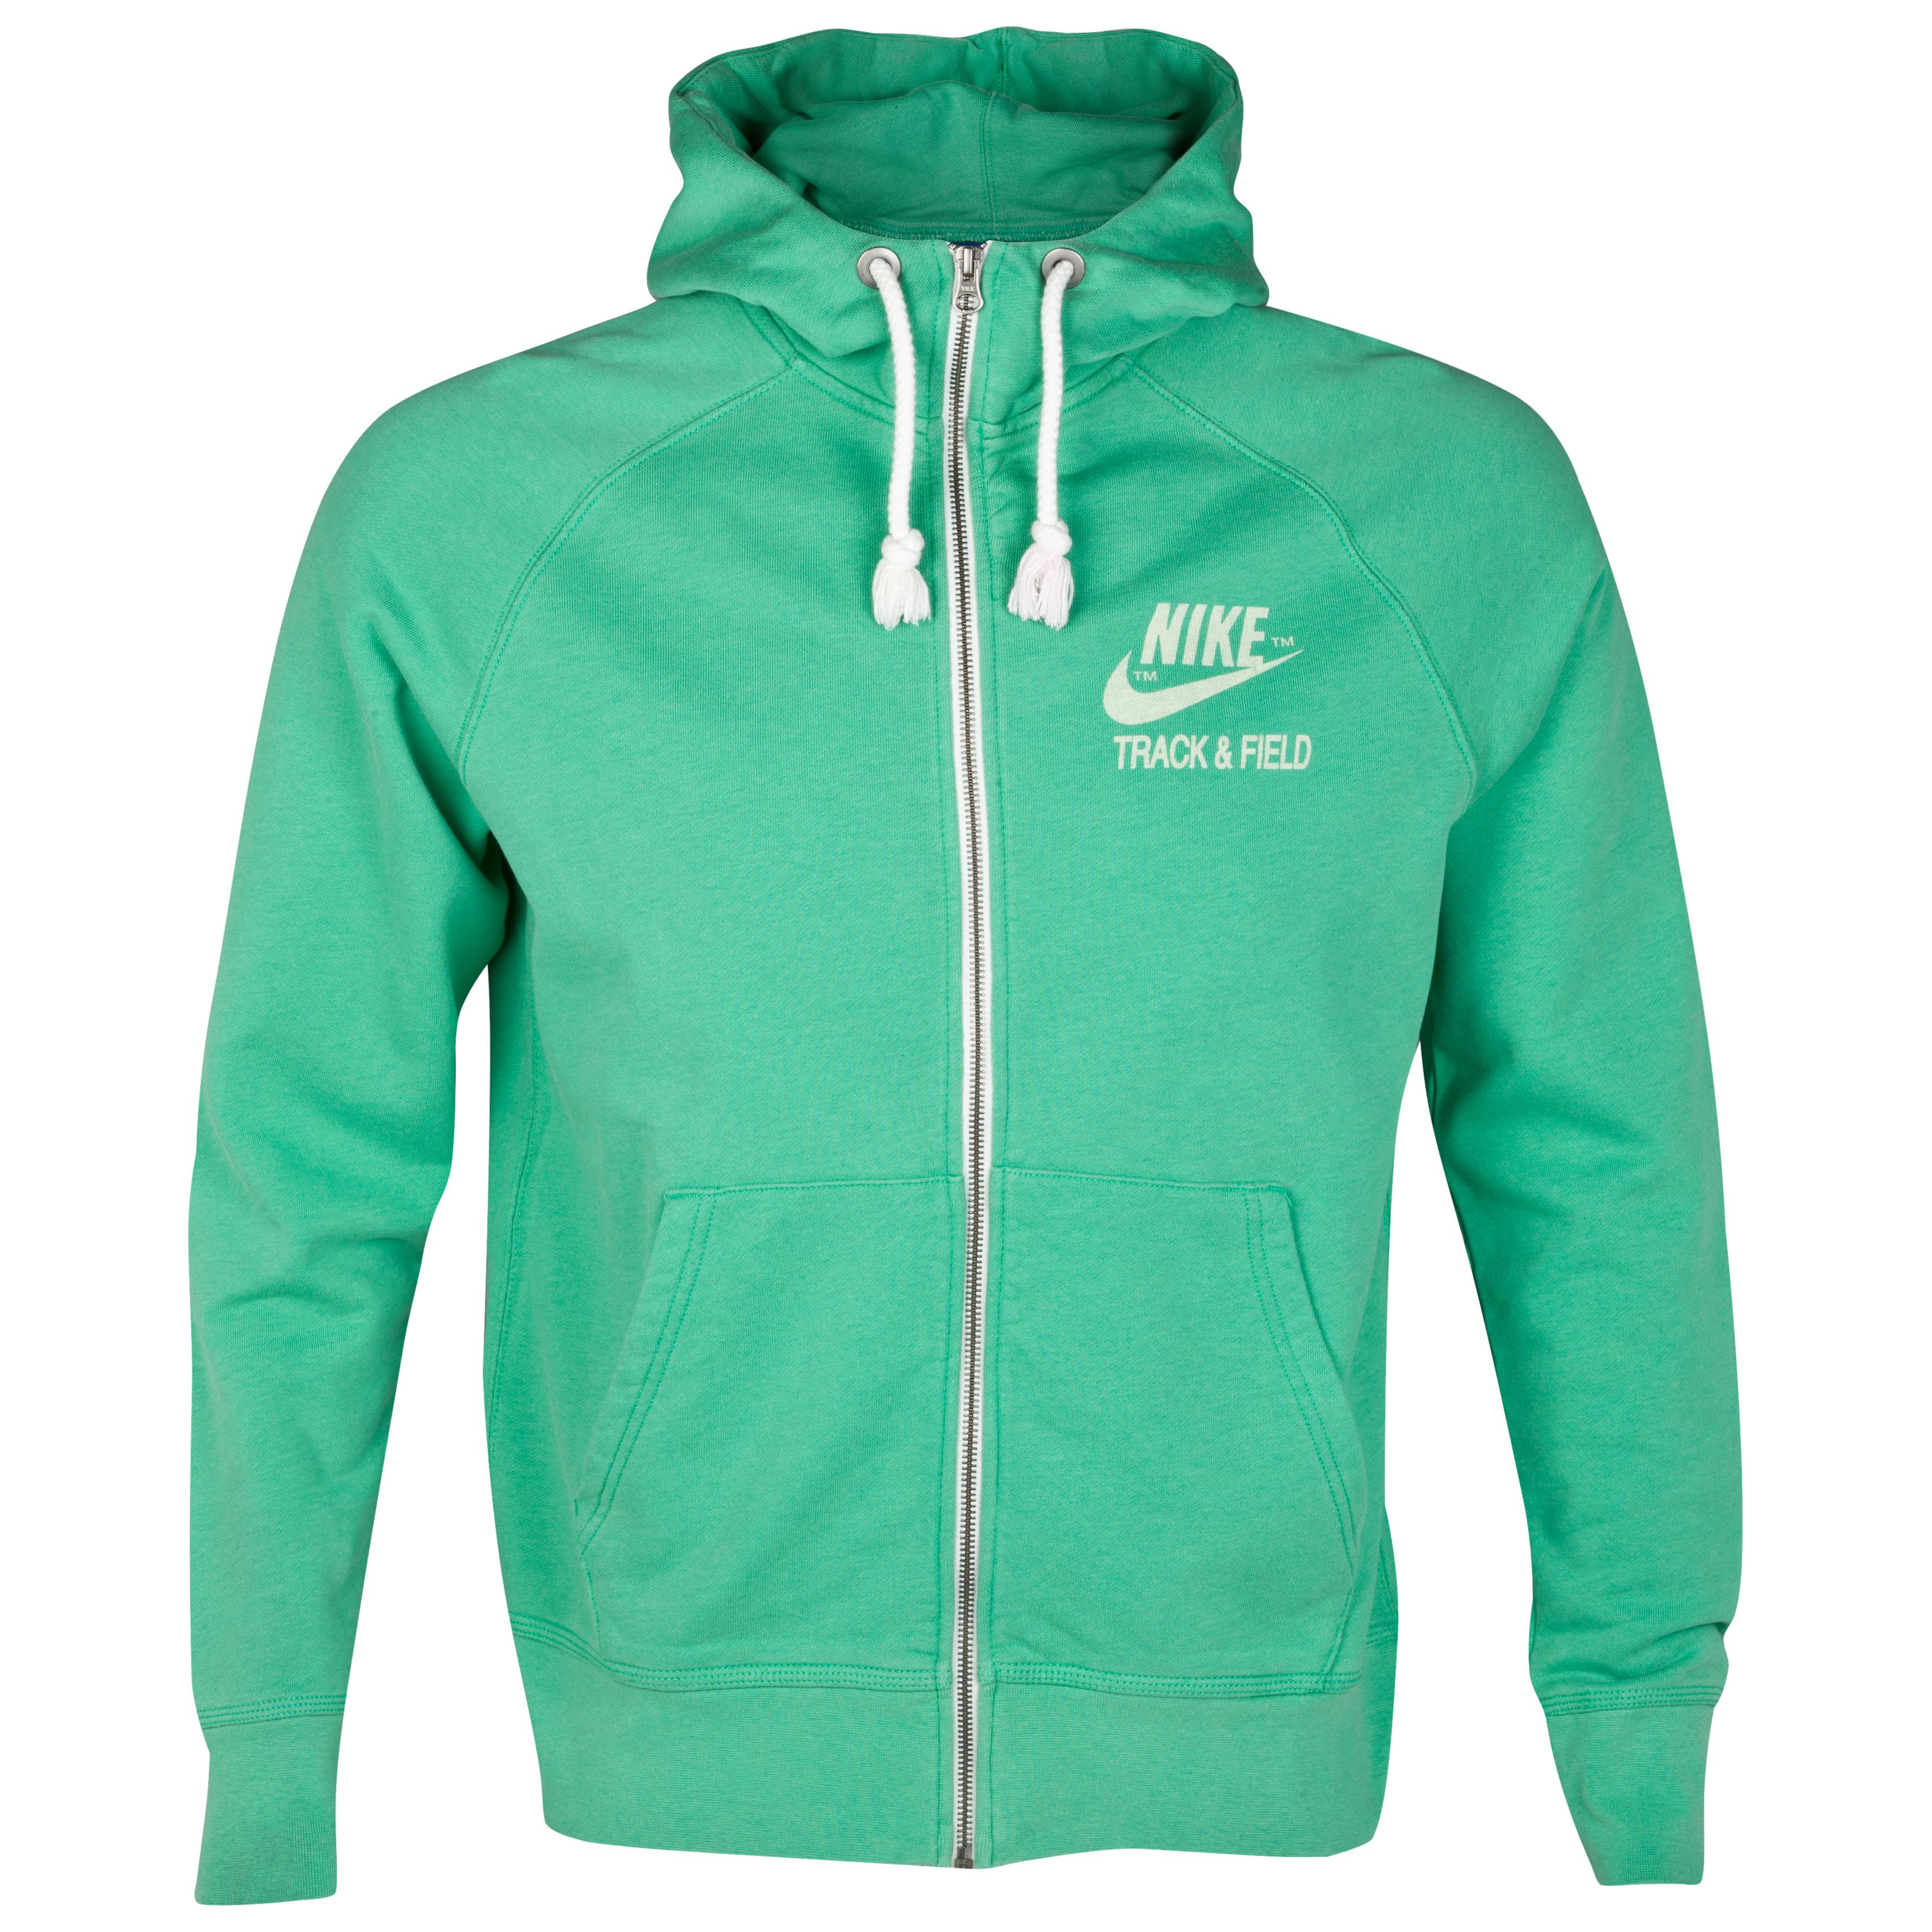 Nike NTandF Graphic AW77 Full Zip Hoody - Stadium Green/Sail